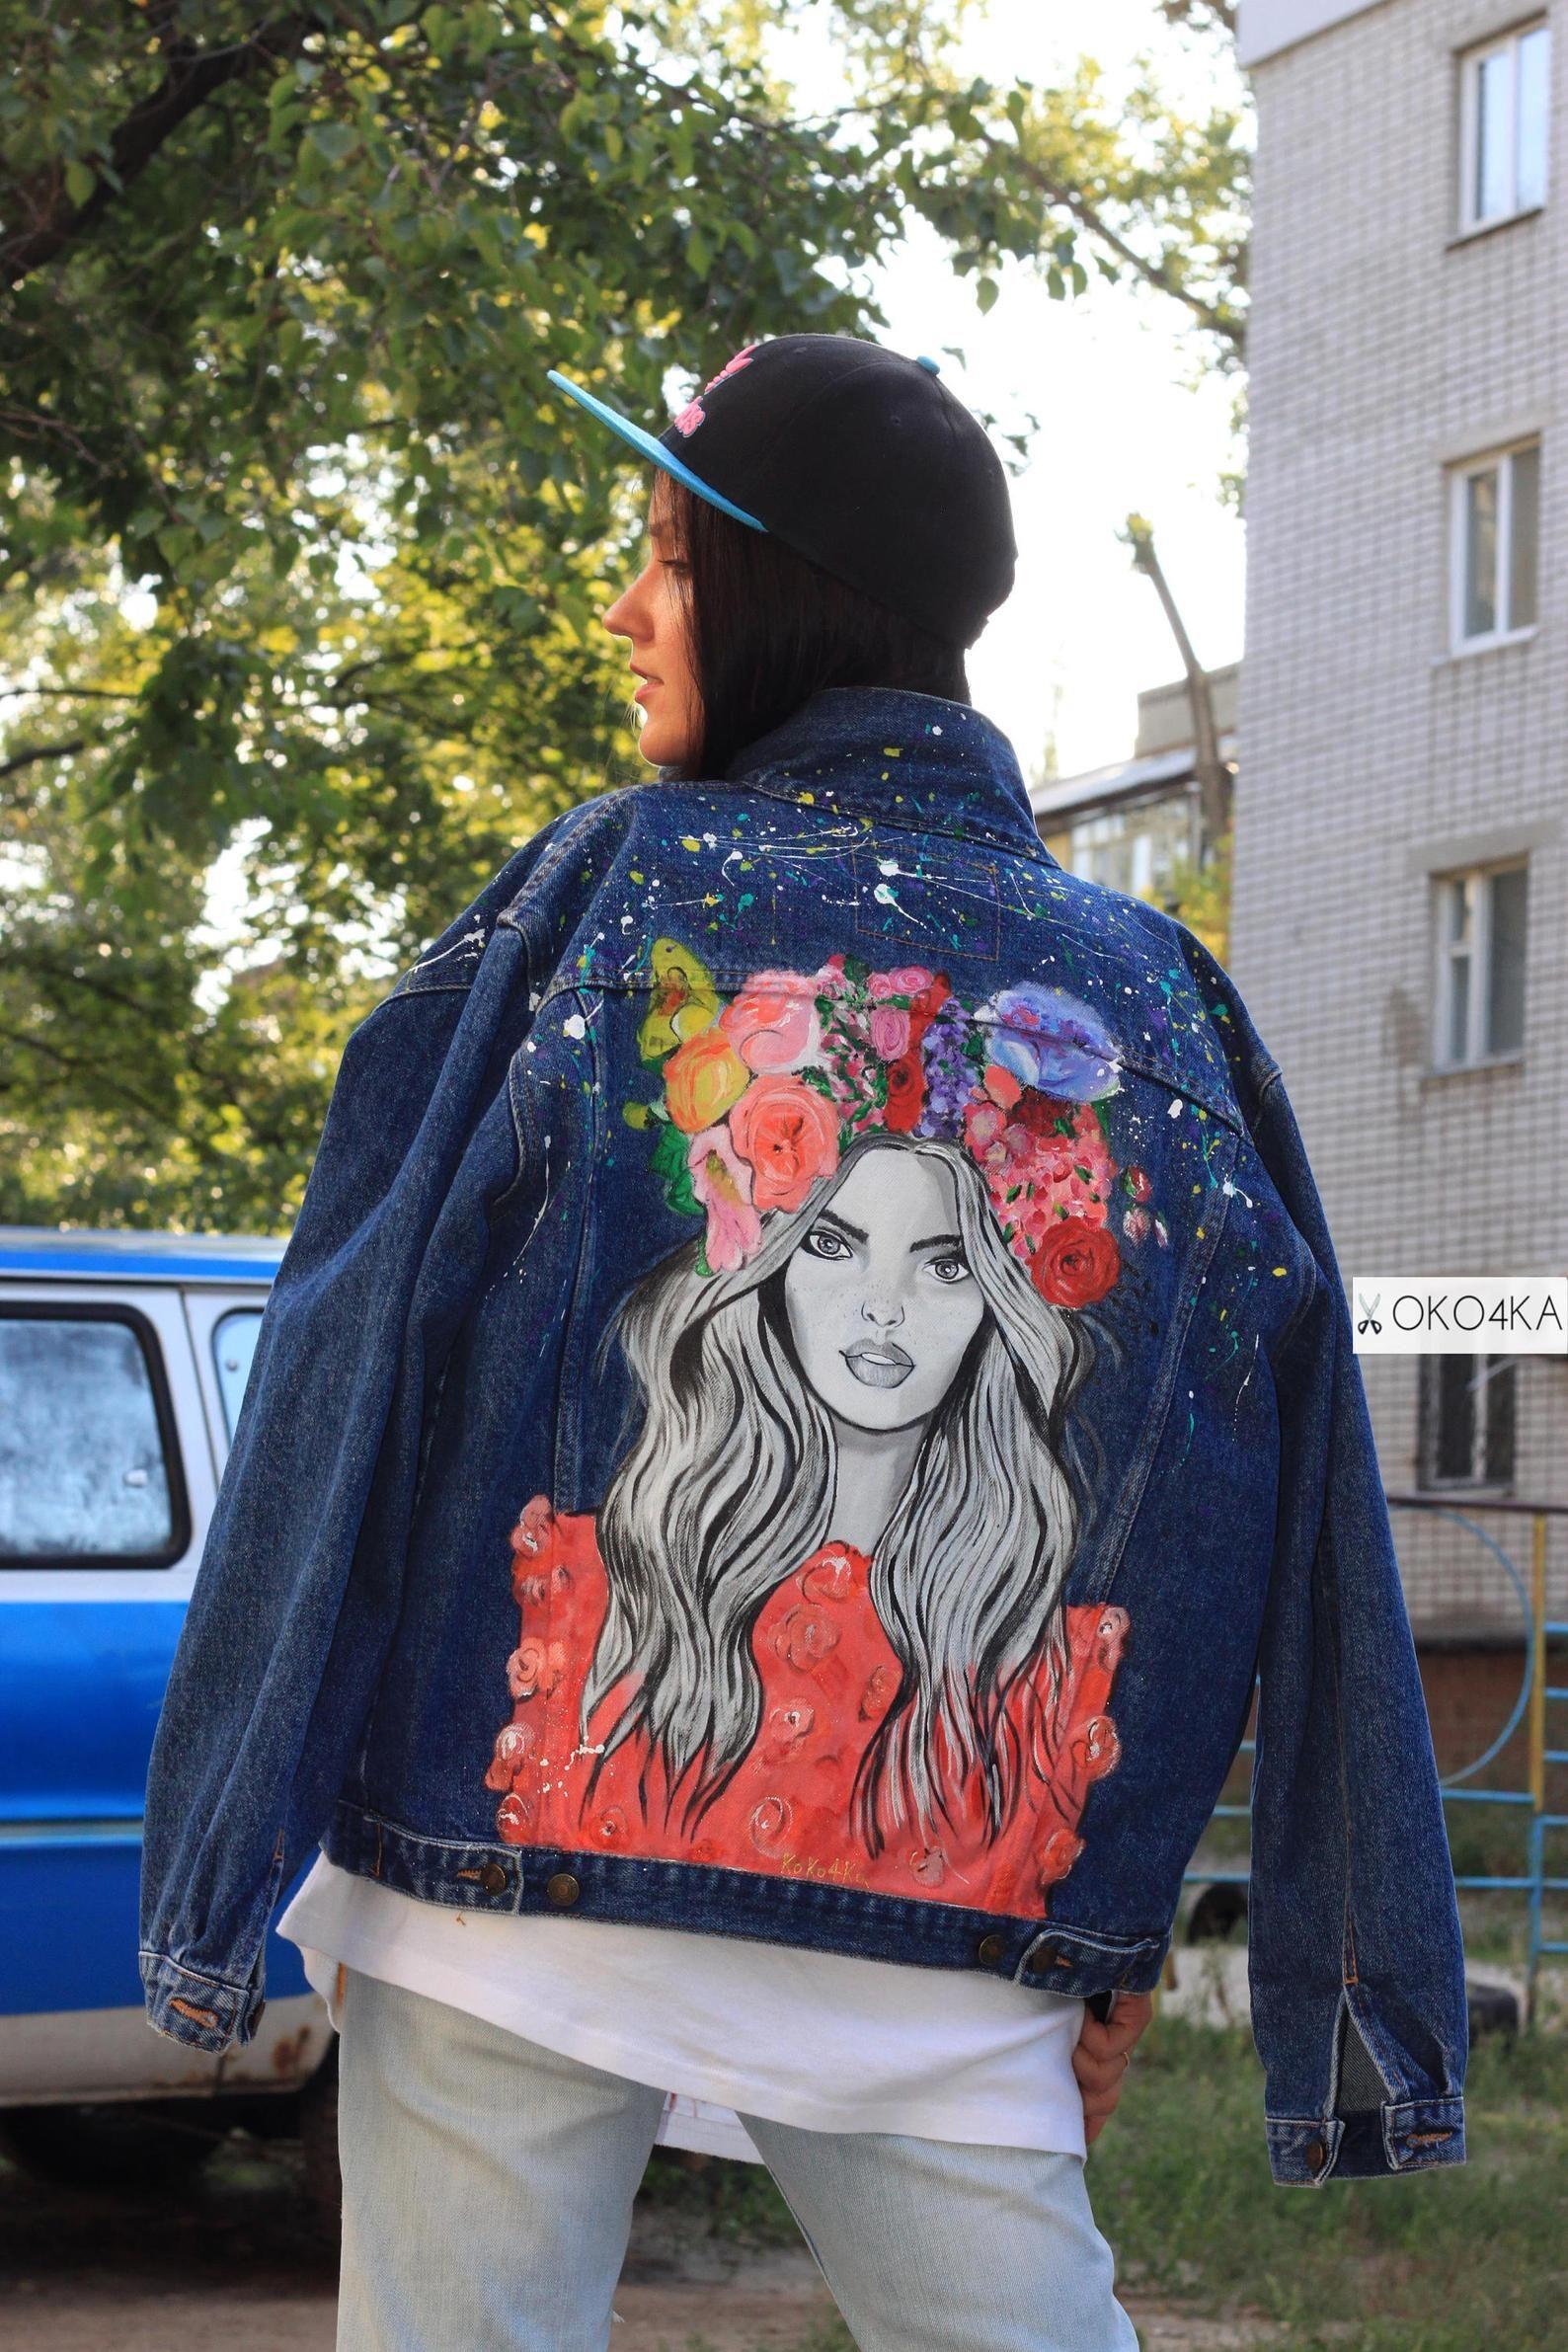 Handpainted denim Jacket painting Jacket with art work on Art on Denim jean Jacket with art pop-art Drawing flowers wreath flowers View item